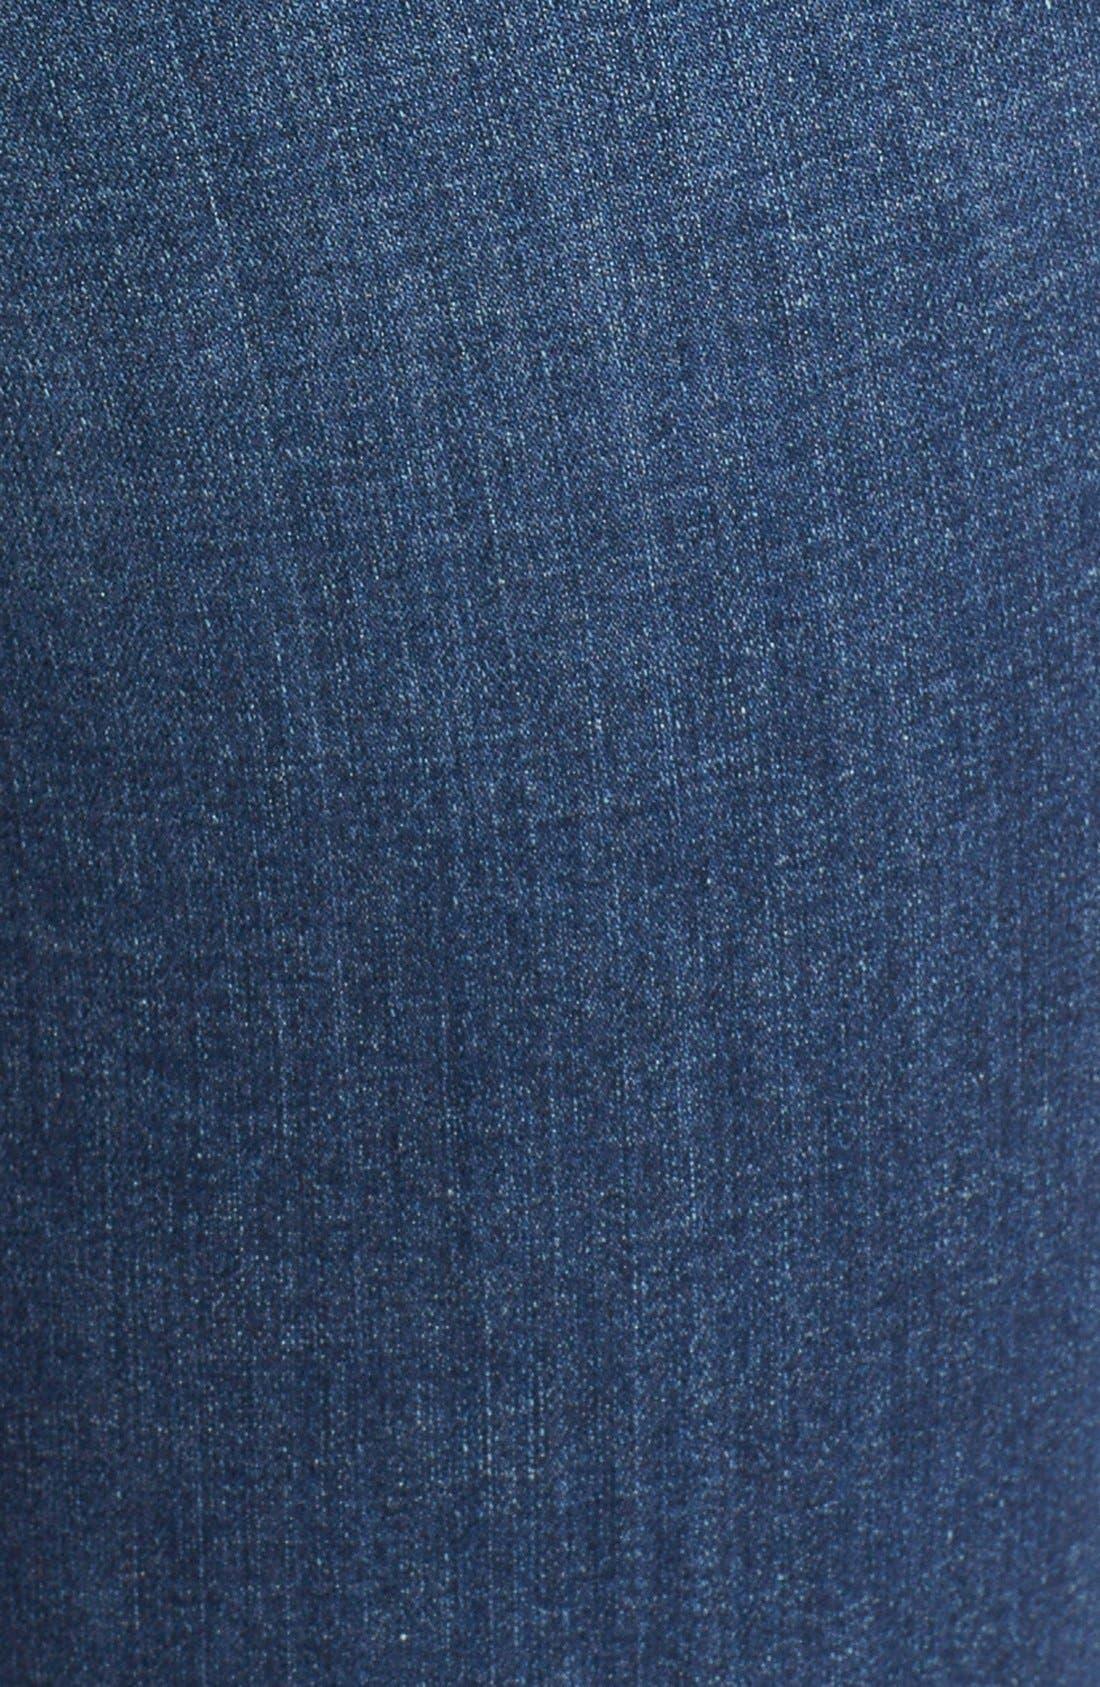 '30' High Rise Skinny Jeans,                             Alternate thumbnail 5, color,                             Dark Vintage